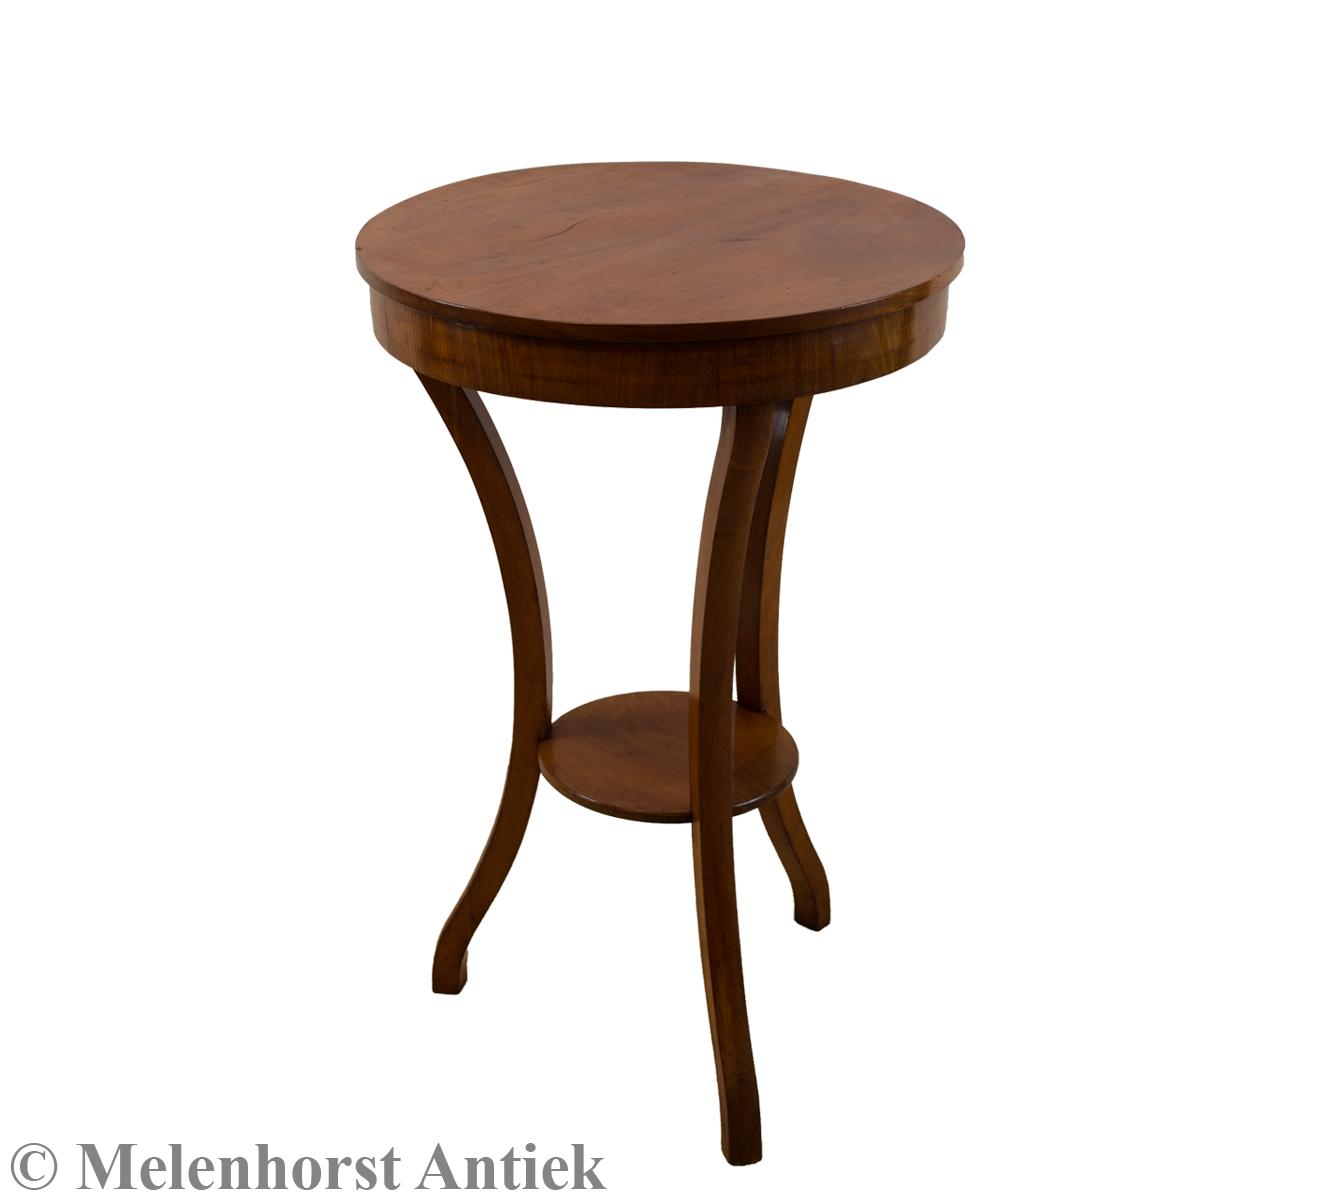 biedermeier tisch antike uhren melenhorst. Black Bedroom Furniture Sets. Home Design Ideas